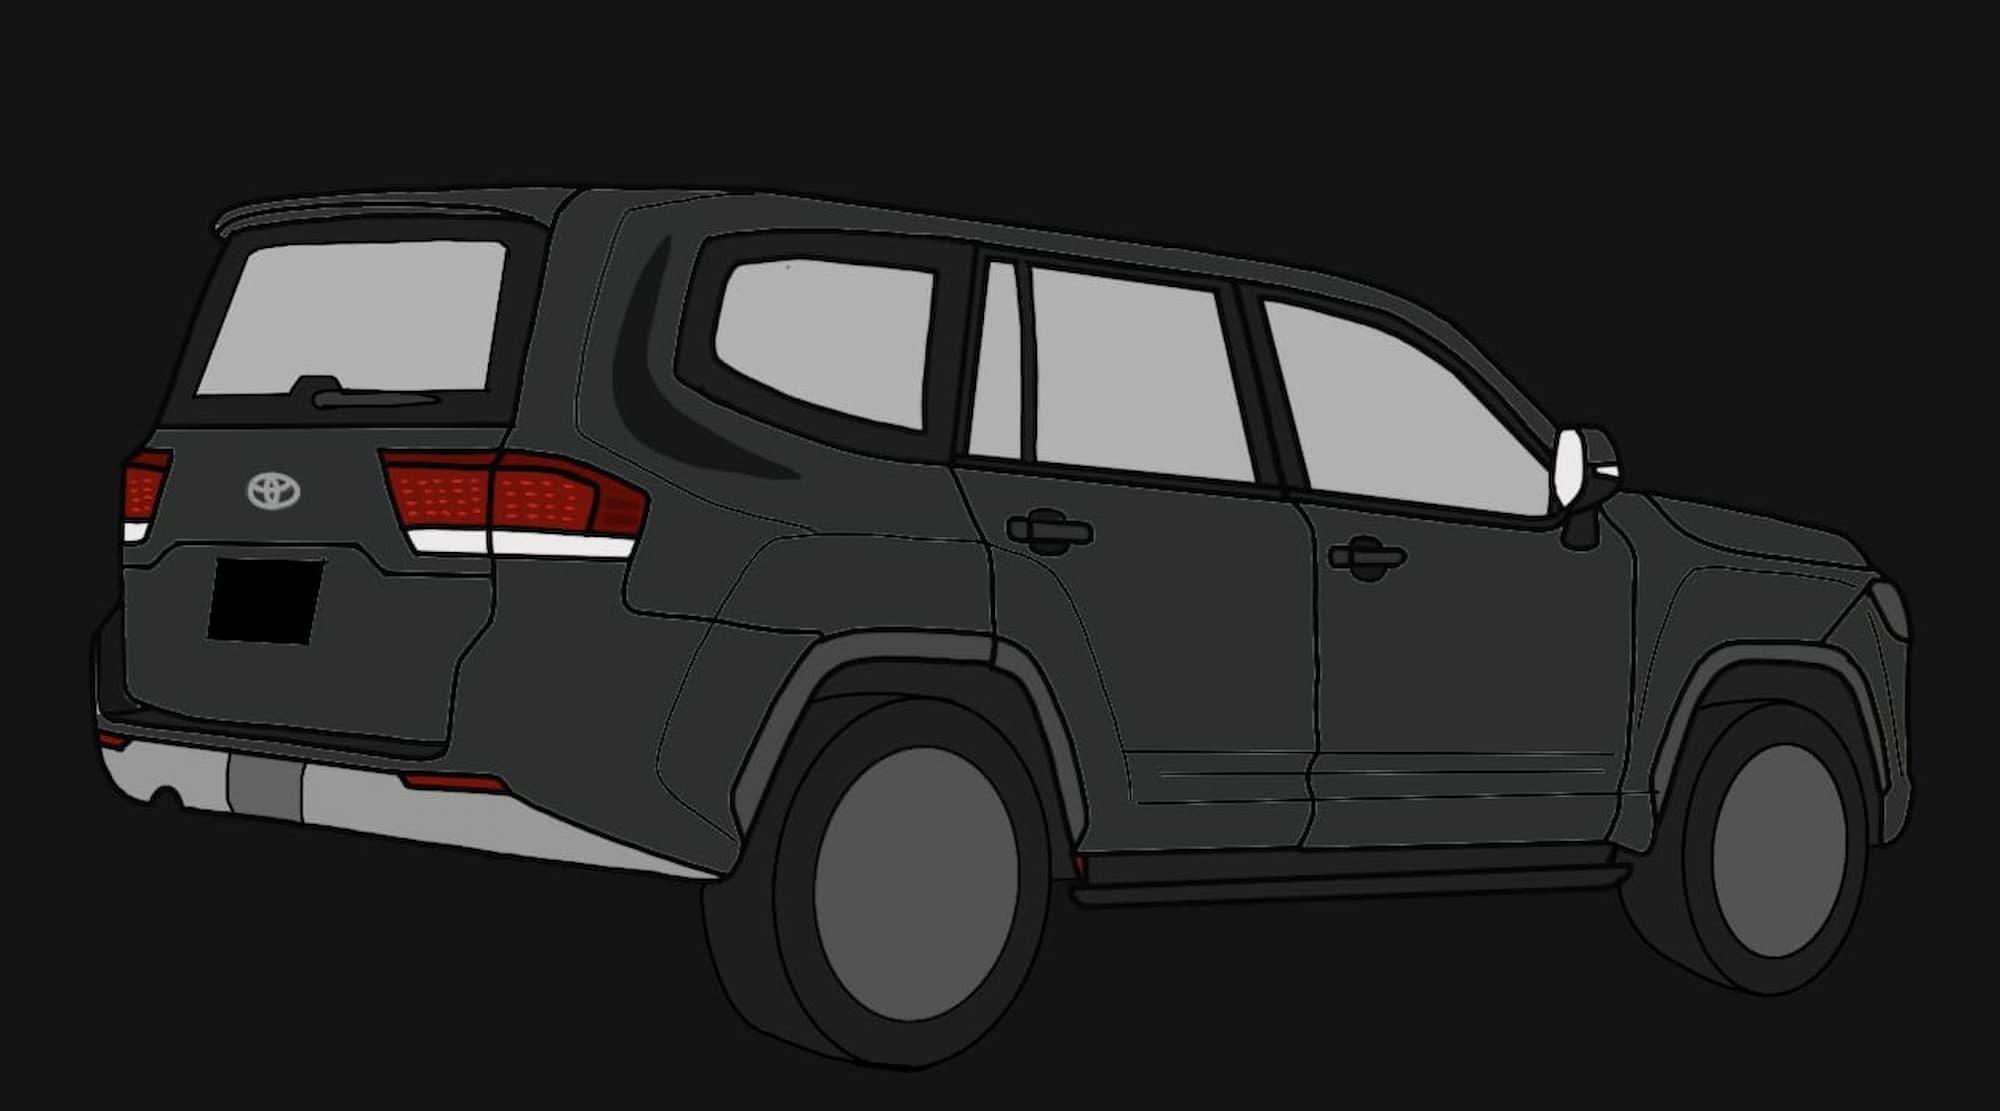 New Toyota Land Cruiser sketch